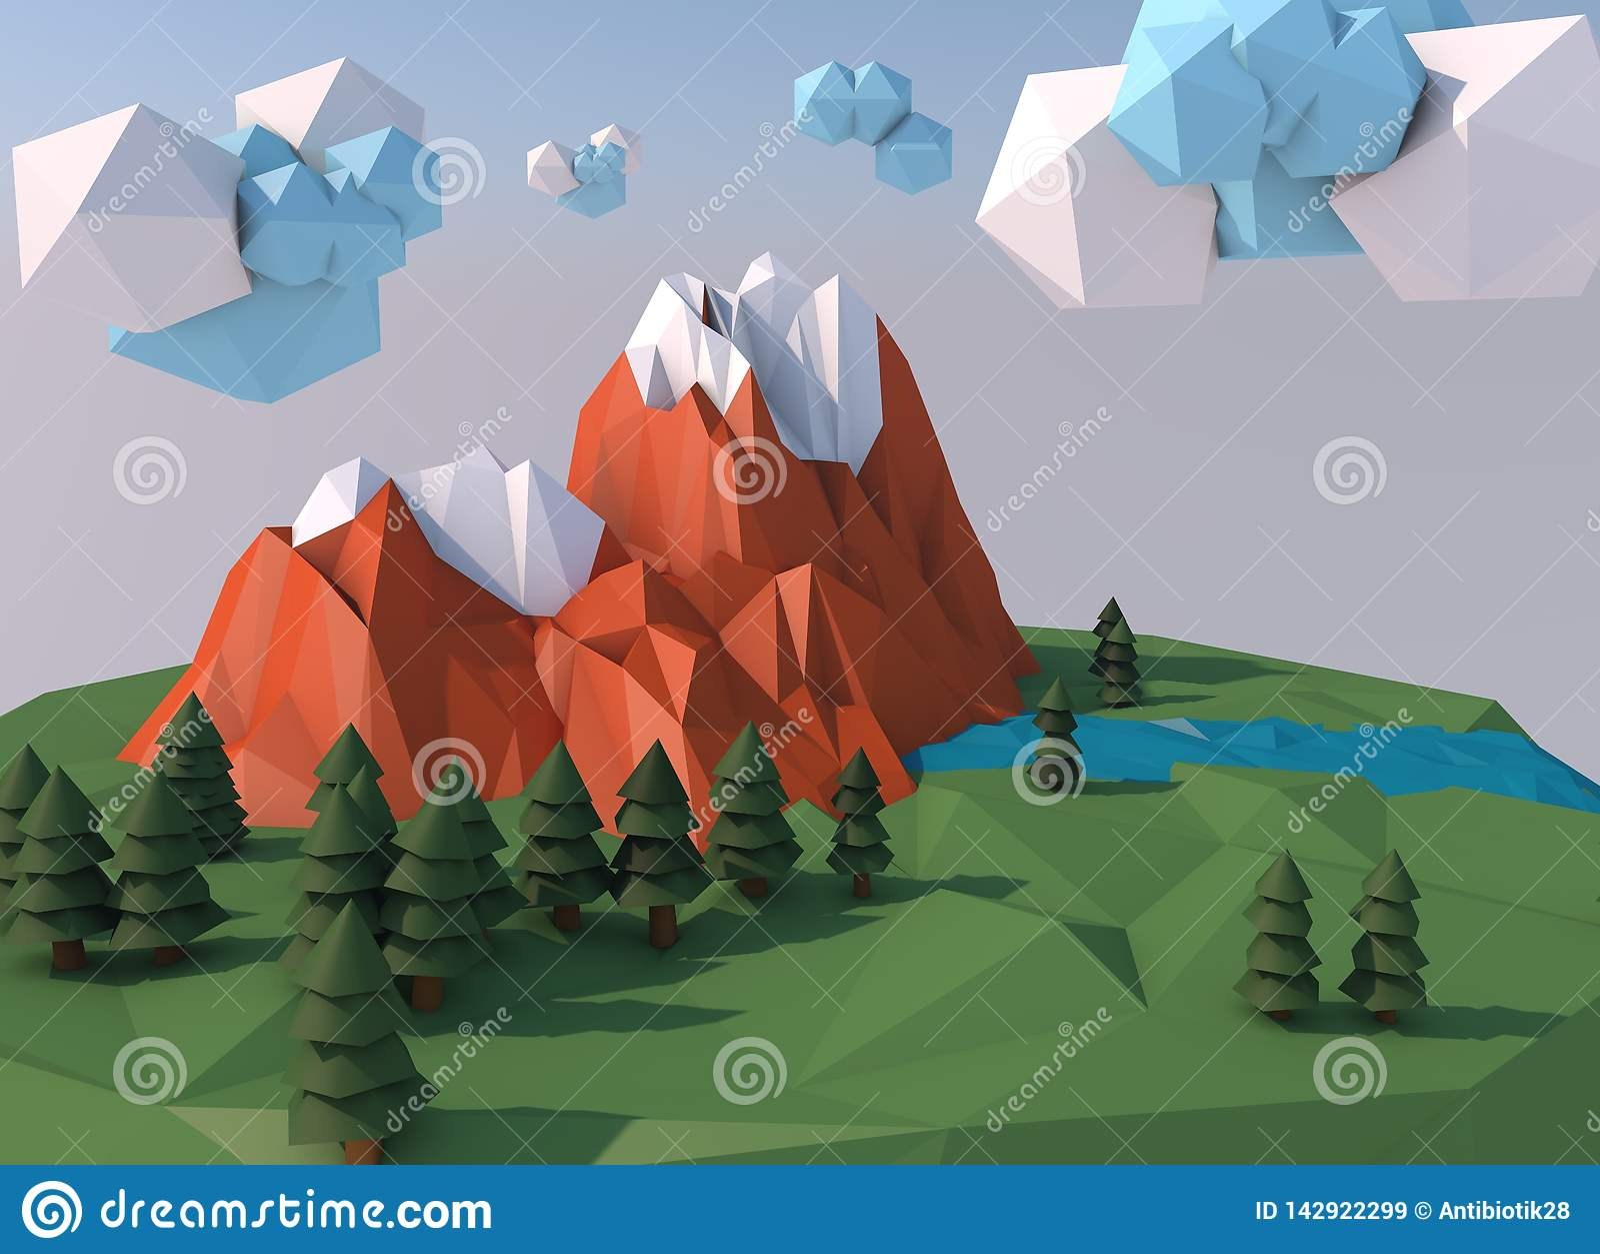 Piękna wyspa z chmurami Niscy poli- 3D odpłacają się